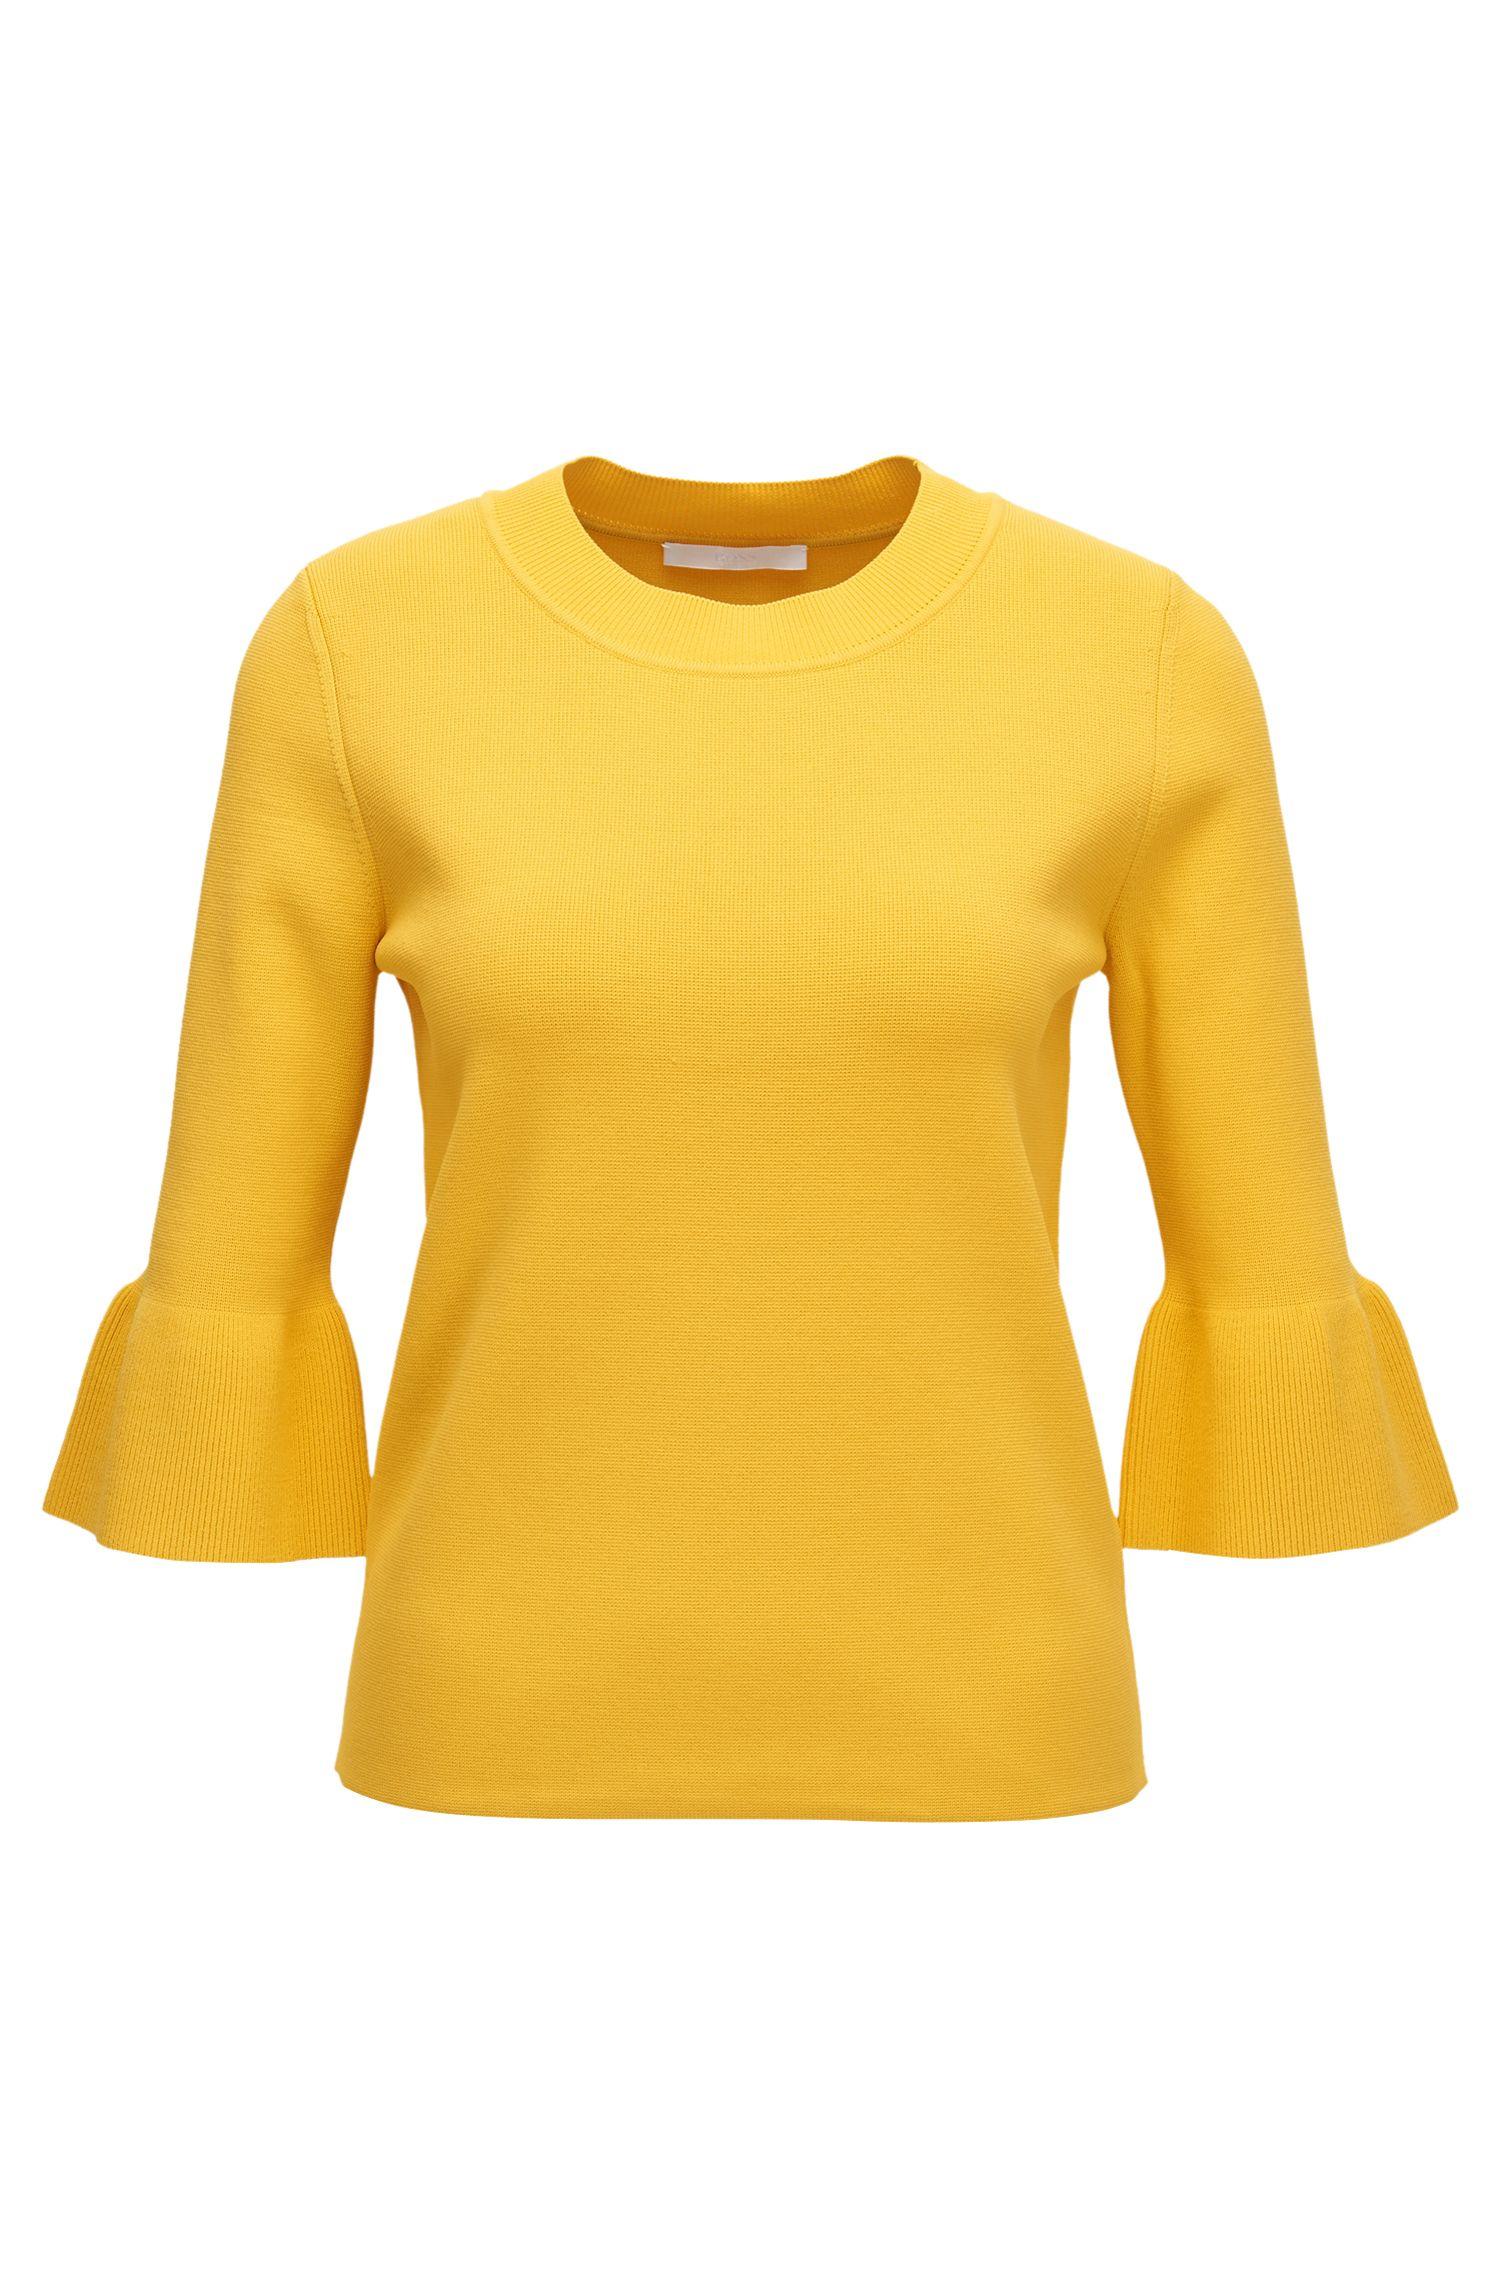 Tulip-sleeve sweater in stretch fabric